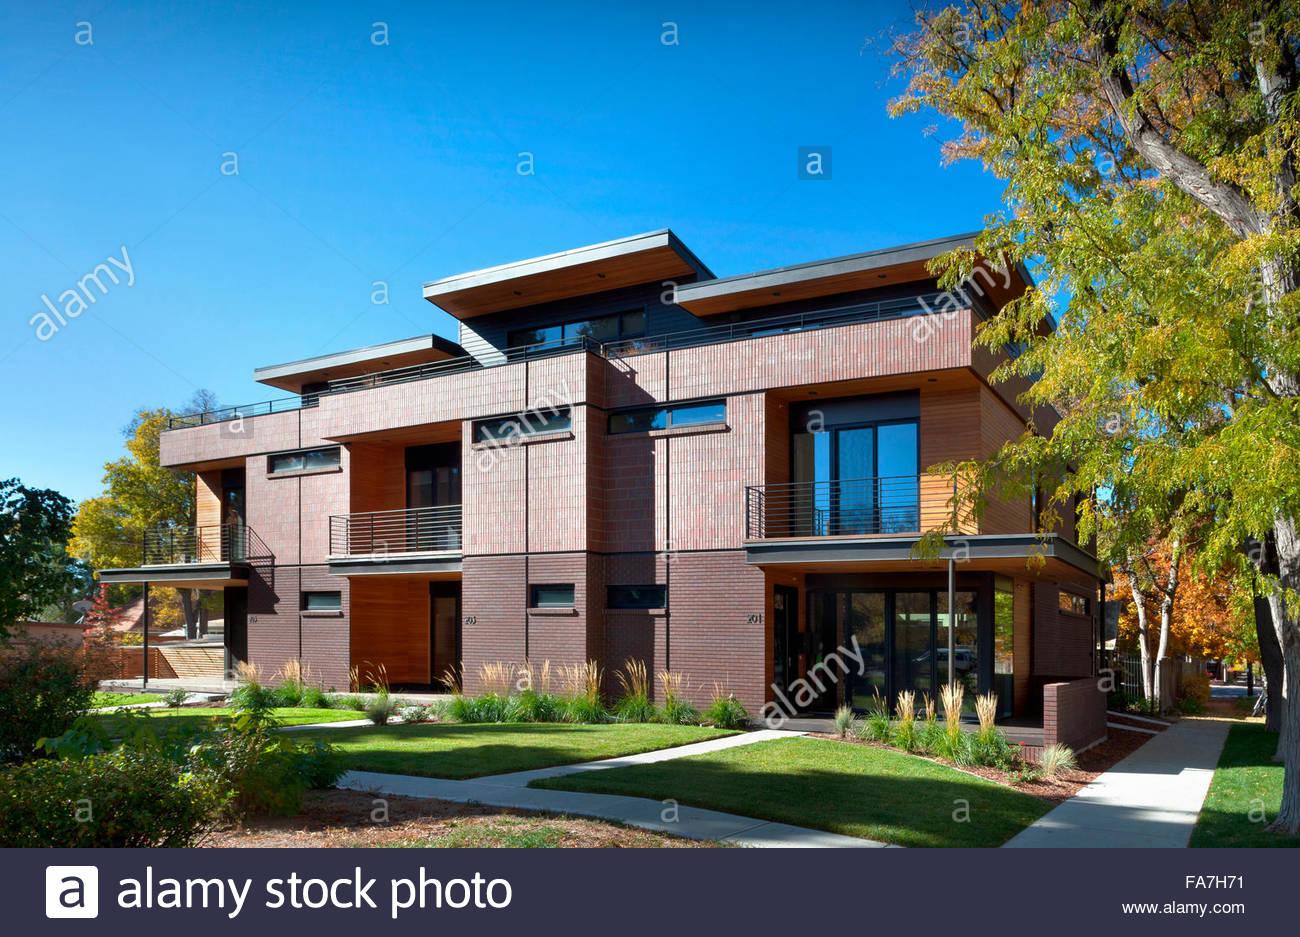 Modern Red Brick Triplex Apartment Home In Colorado